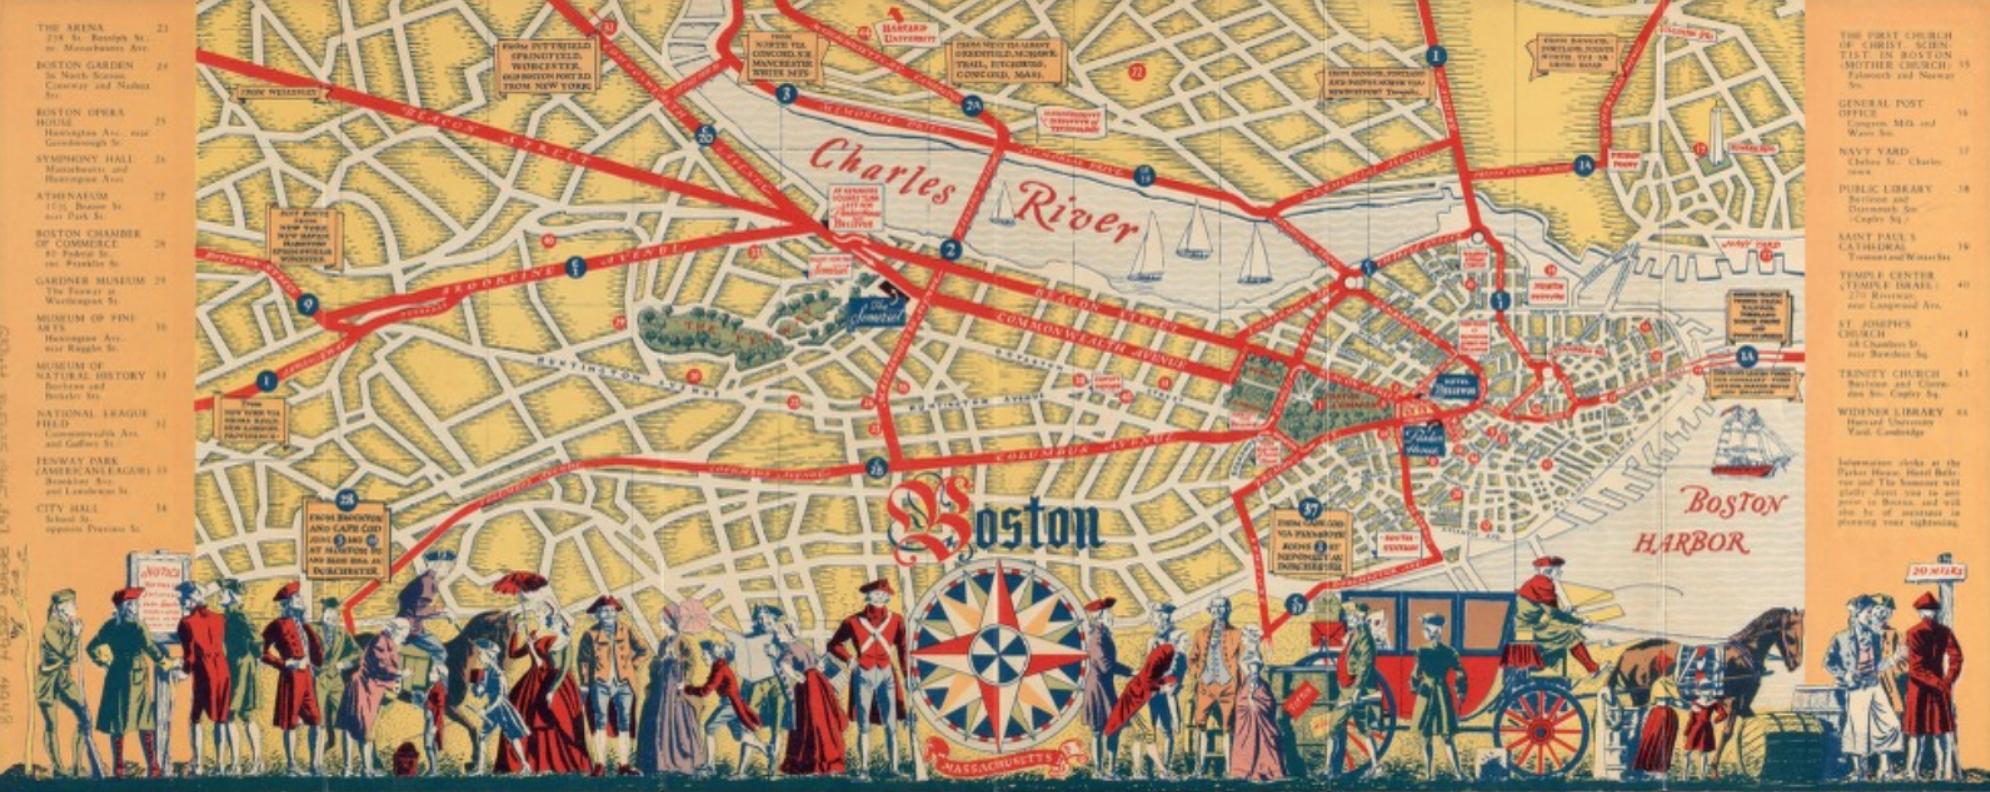 Tourist Map of Boston